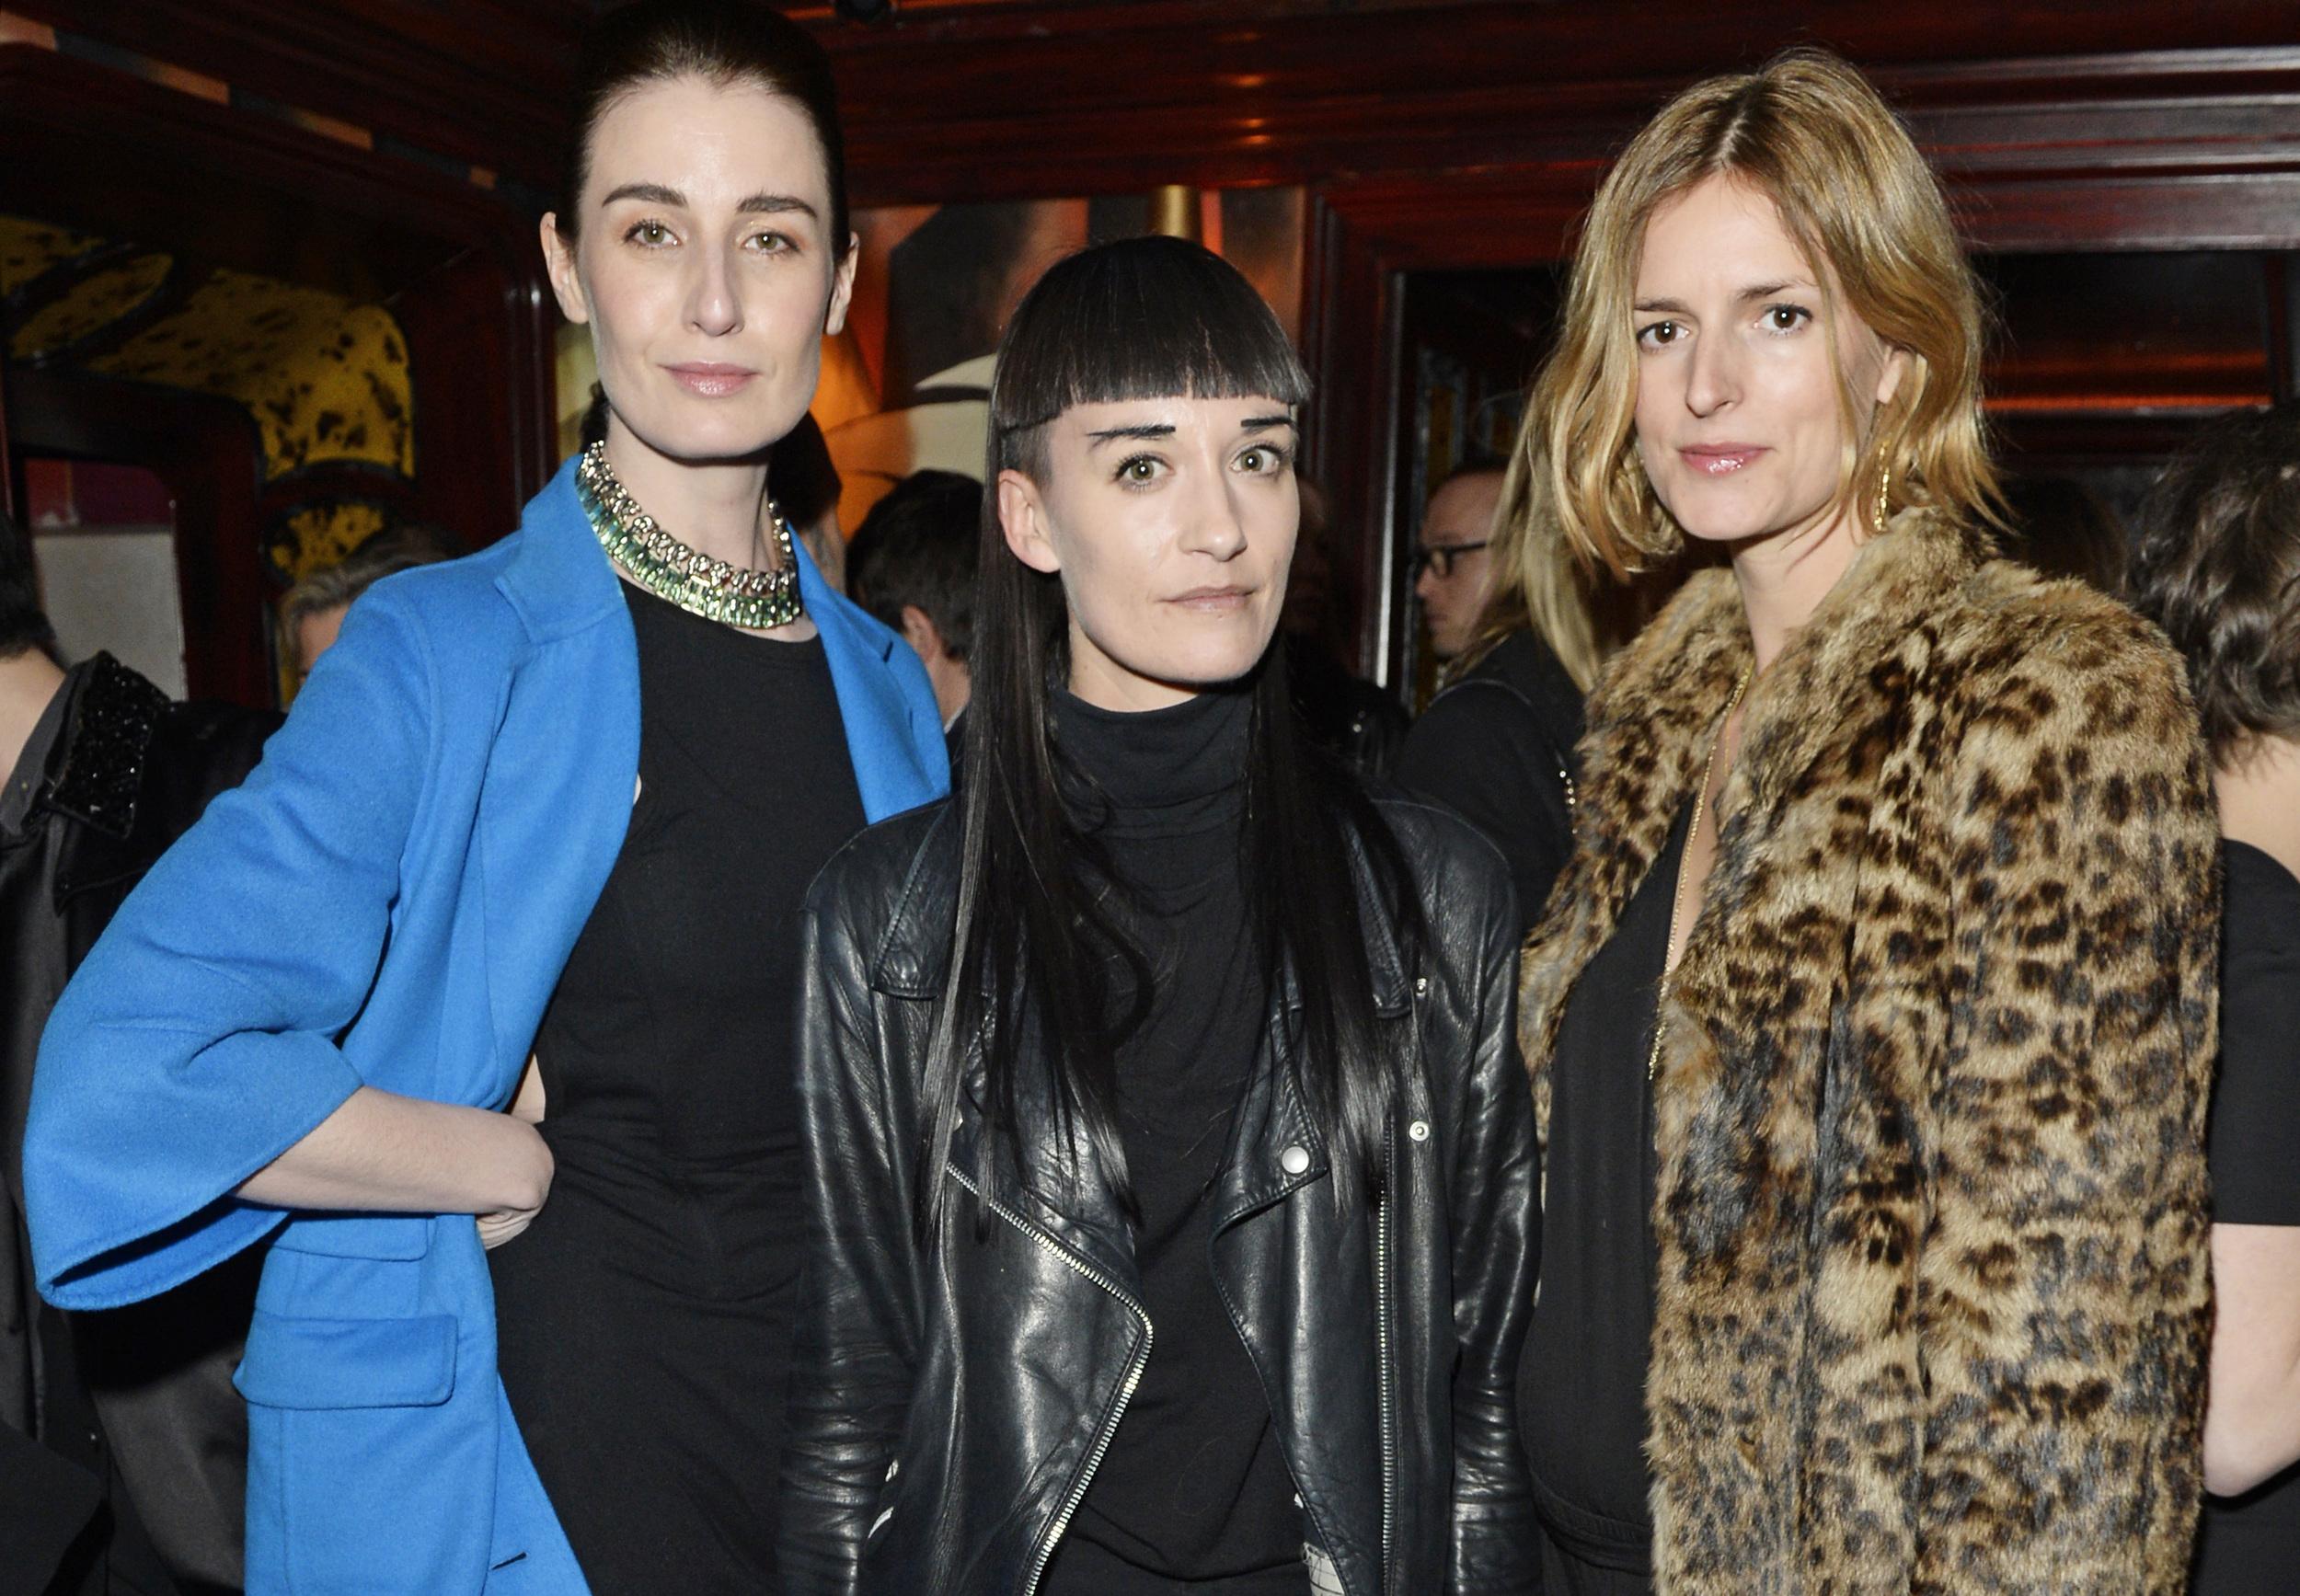 Erin O'Connor, Hannah Marshall, Jacquetta Wheeler.JPG